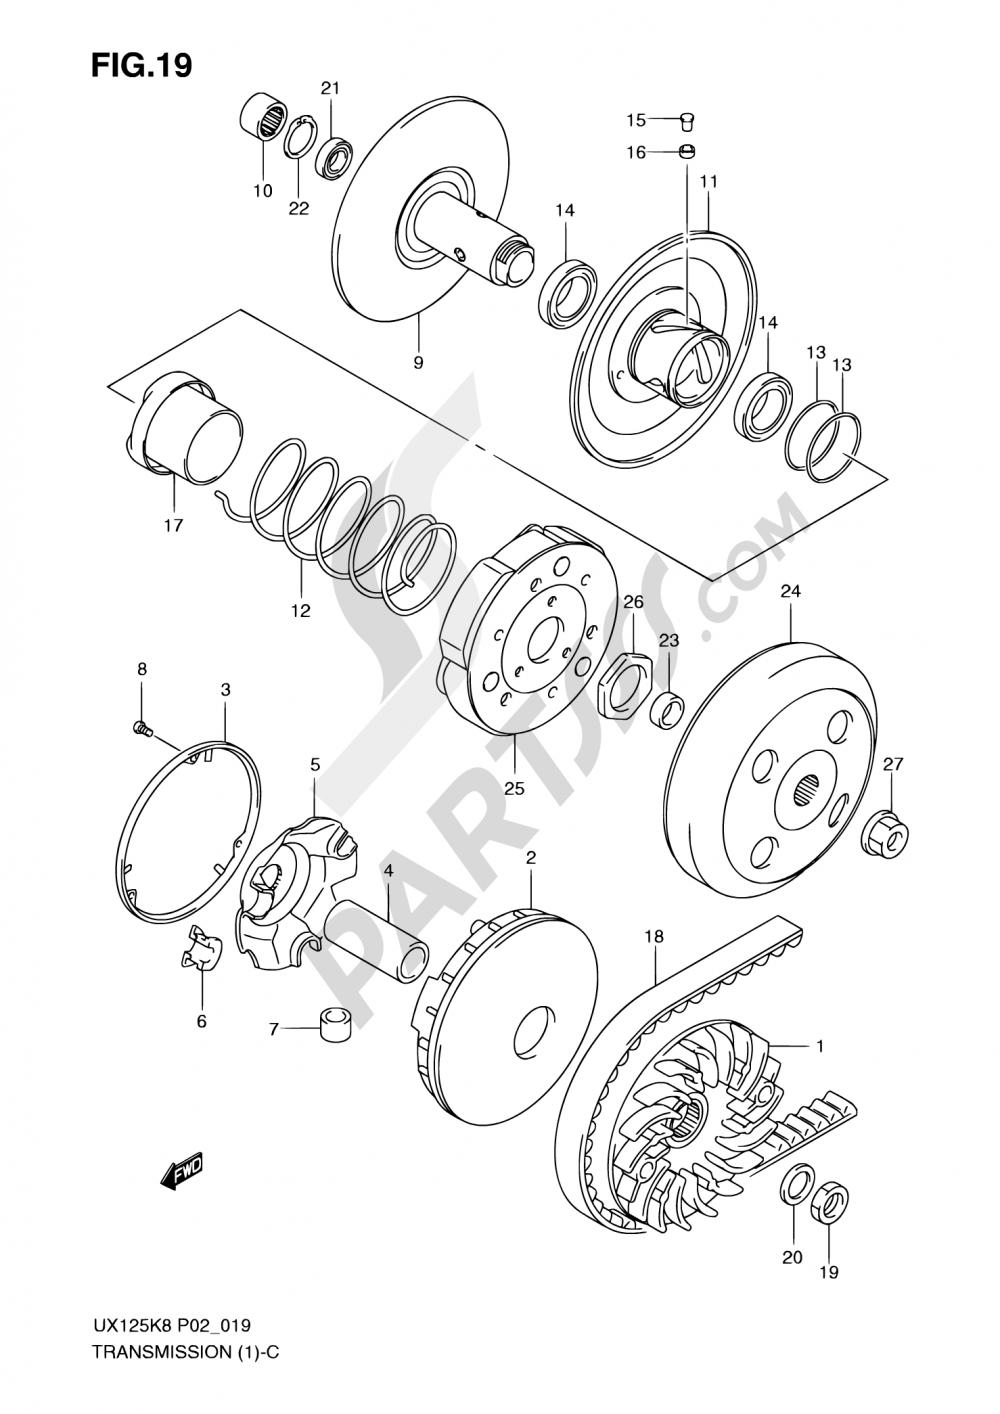 19 - TRANSMISSION (1) Suzuki SIXTEEN UX125 2010